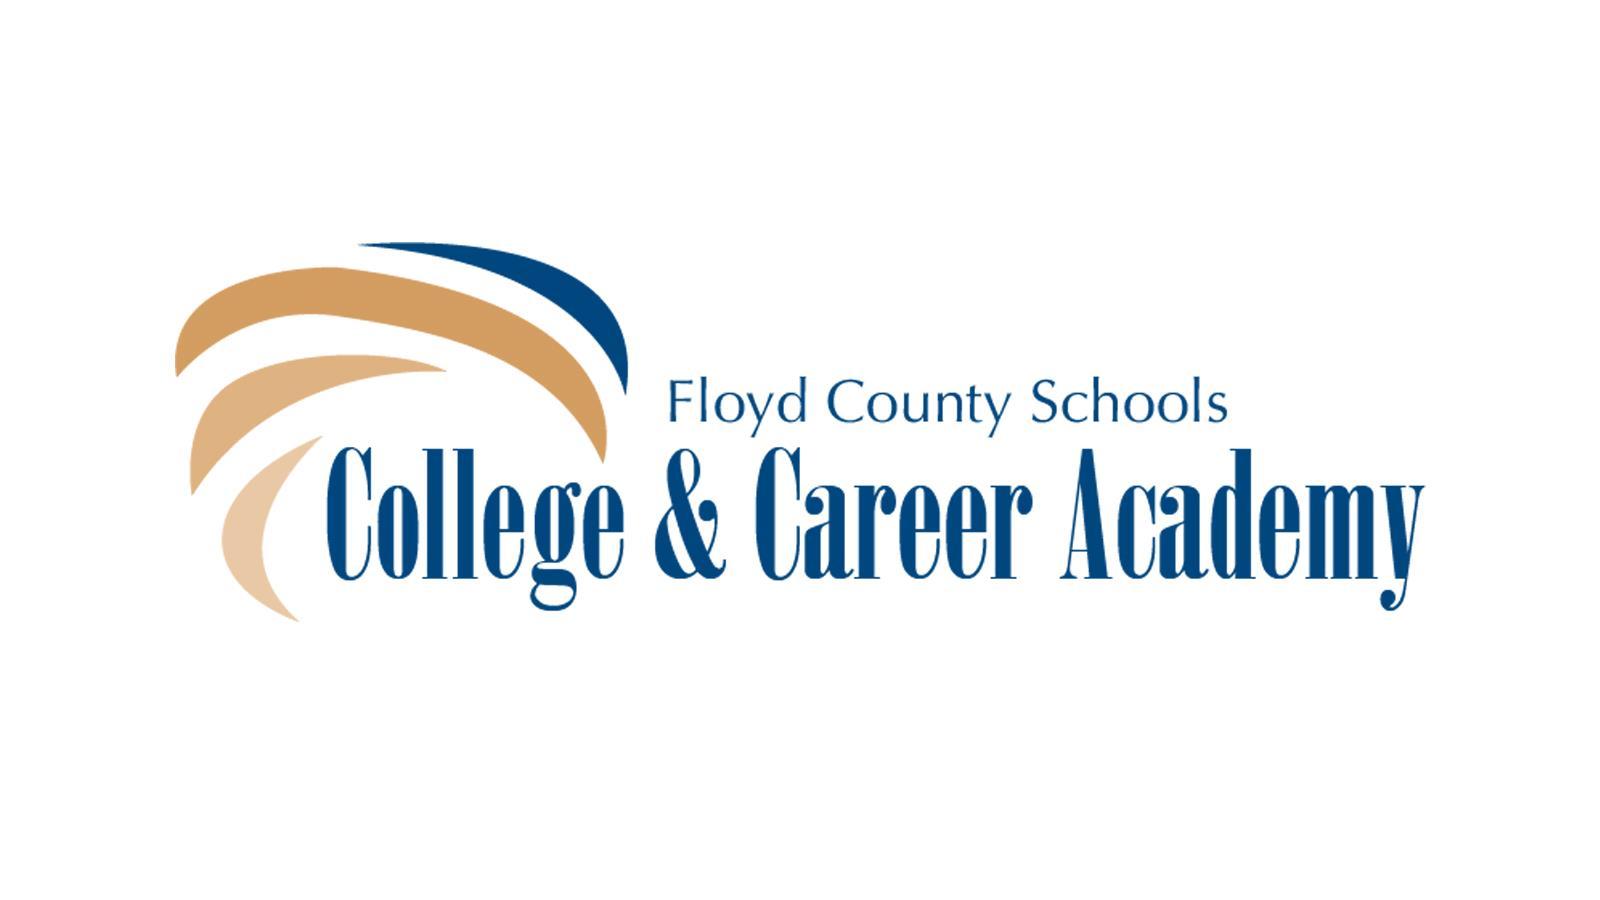 FCS College _ Career Academy Logo.jpg